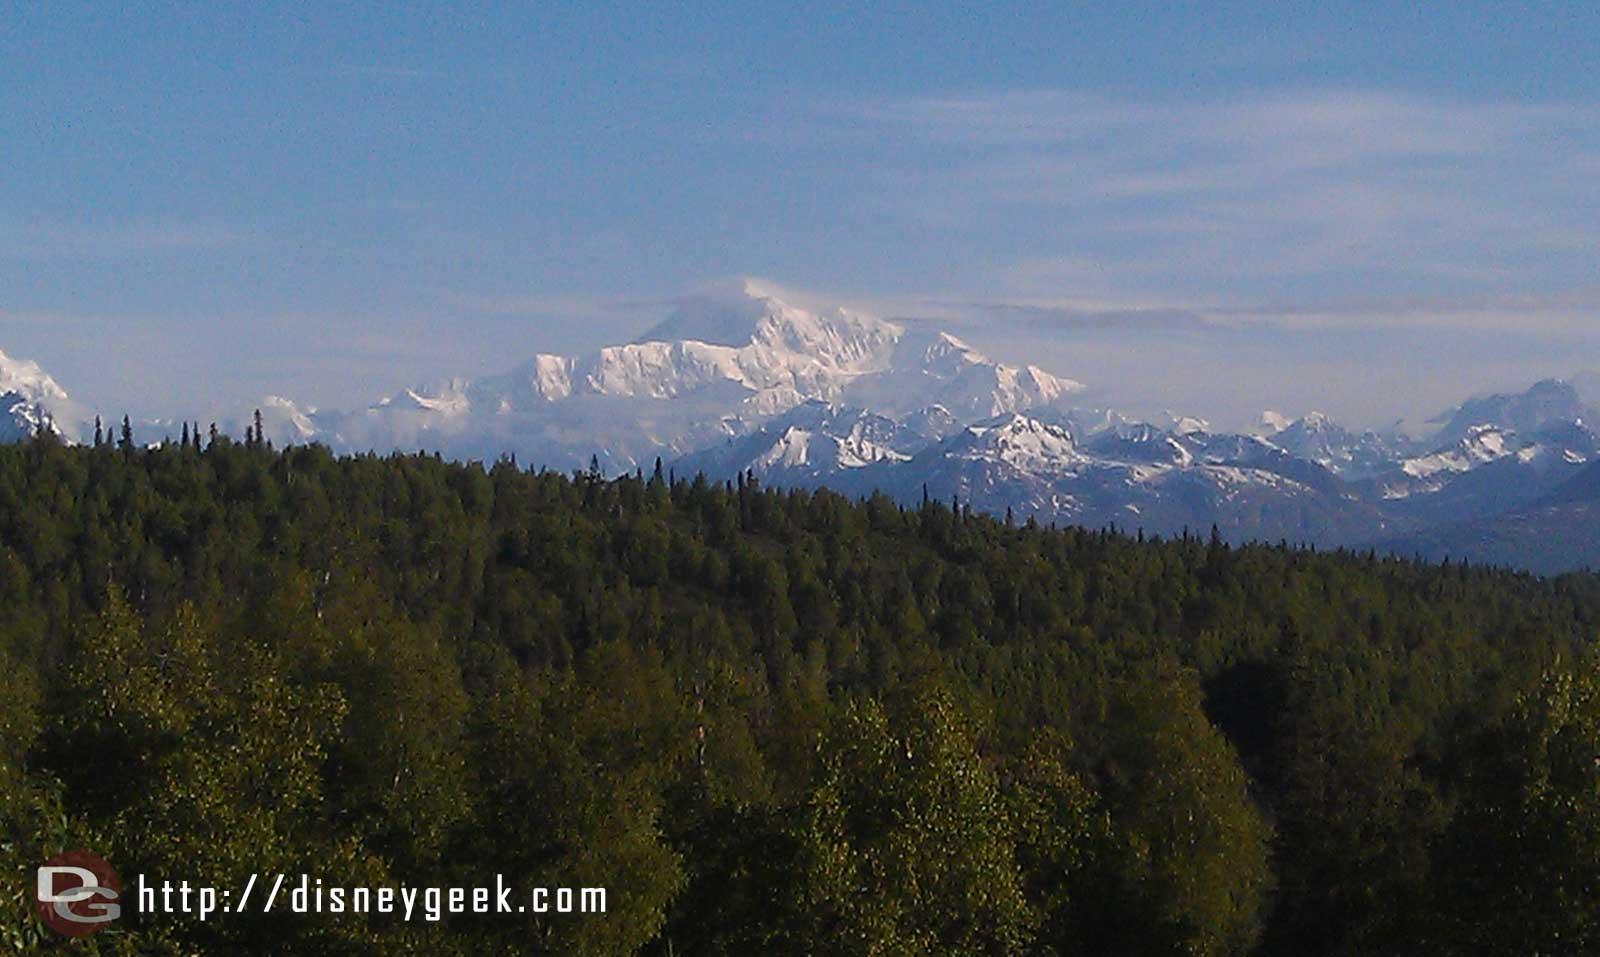 A tighter shot of Mt McKinley #Alaska